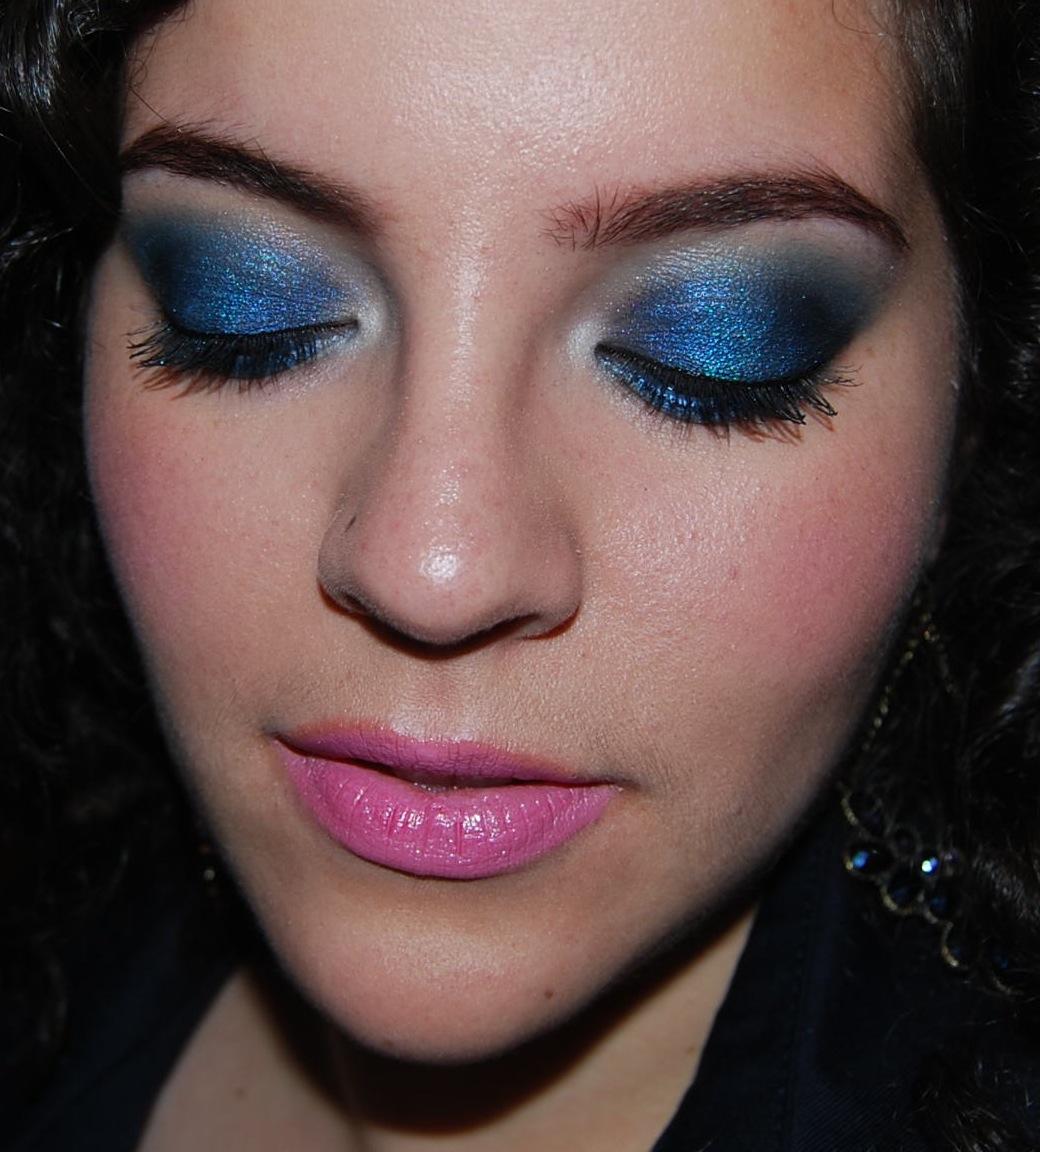 Makeup As Expression ♡: Smokey Blue + Pink Lips